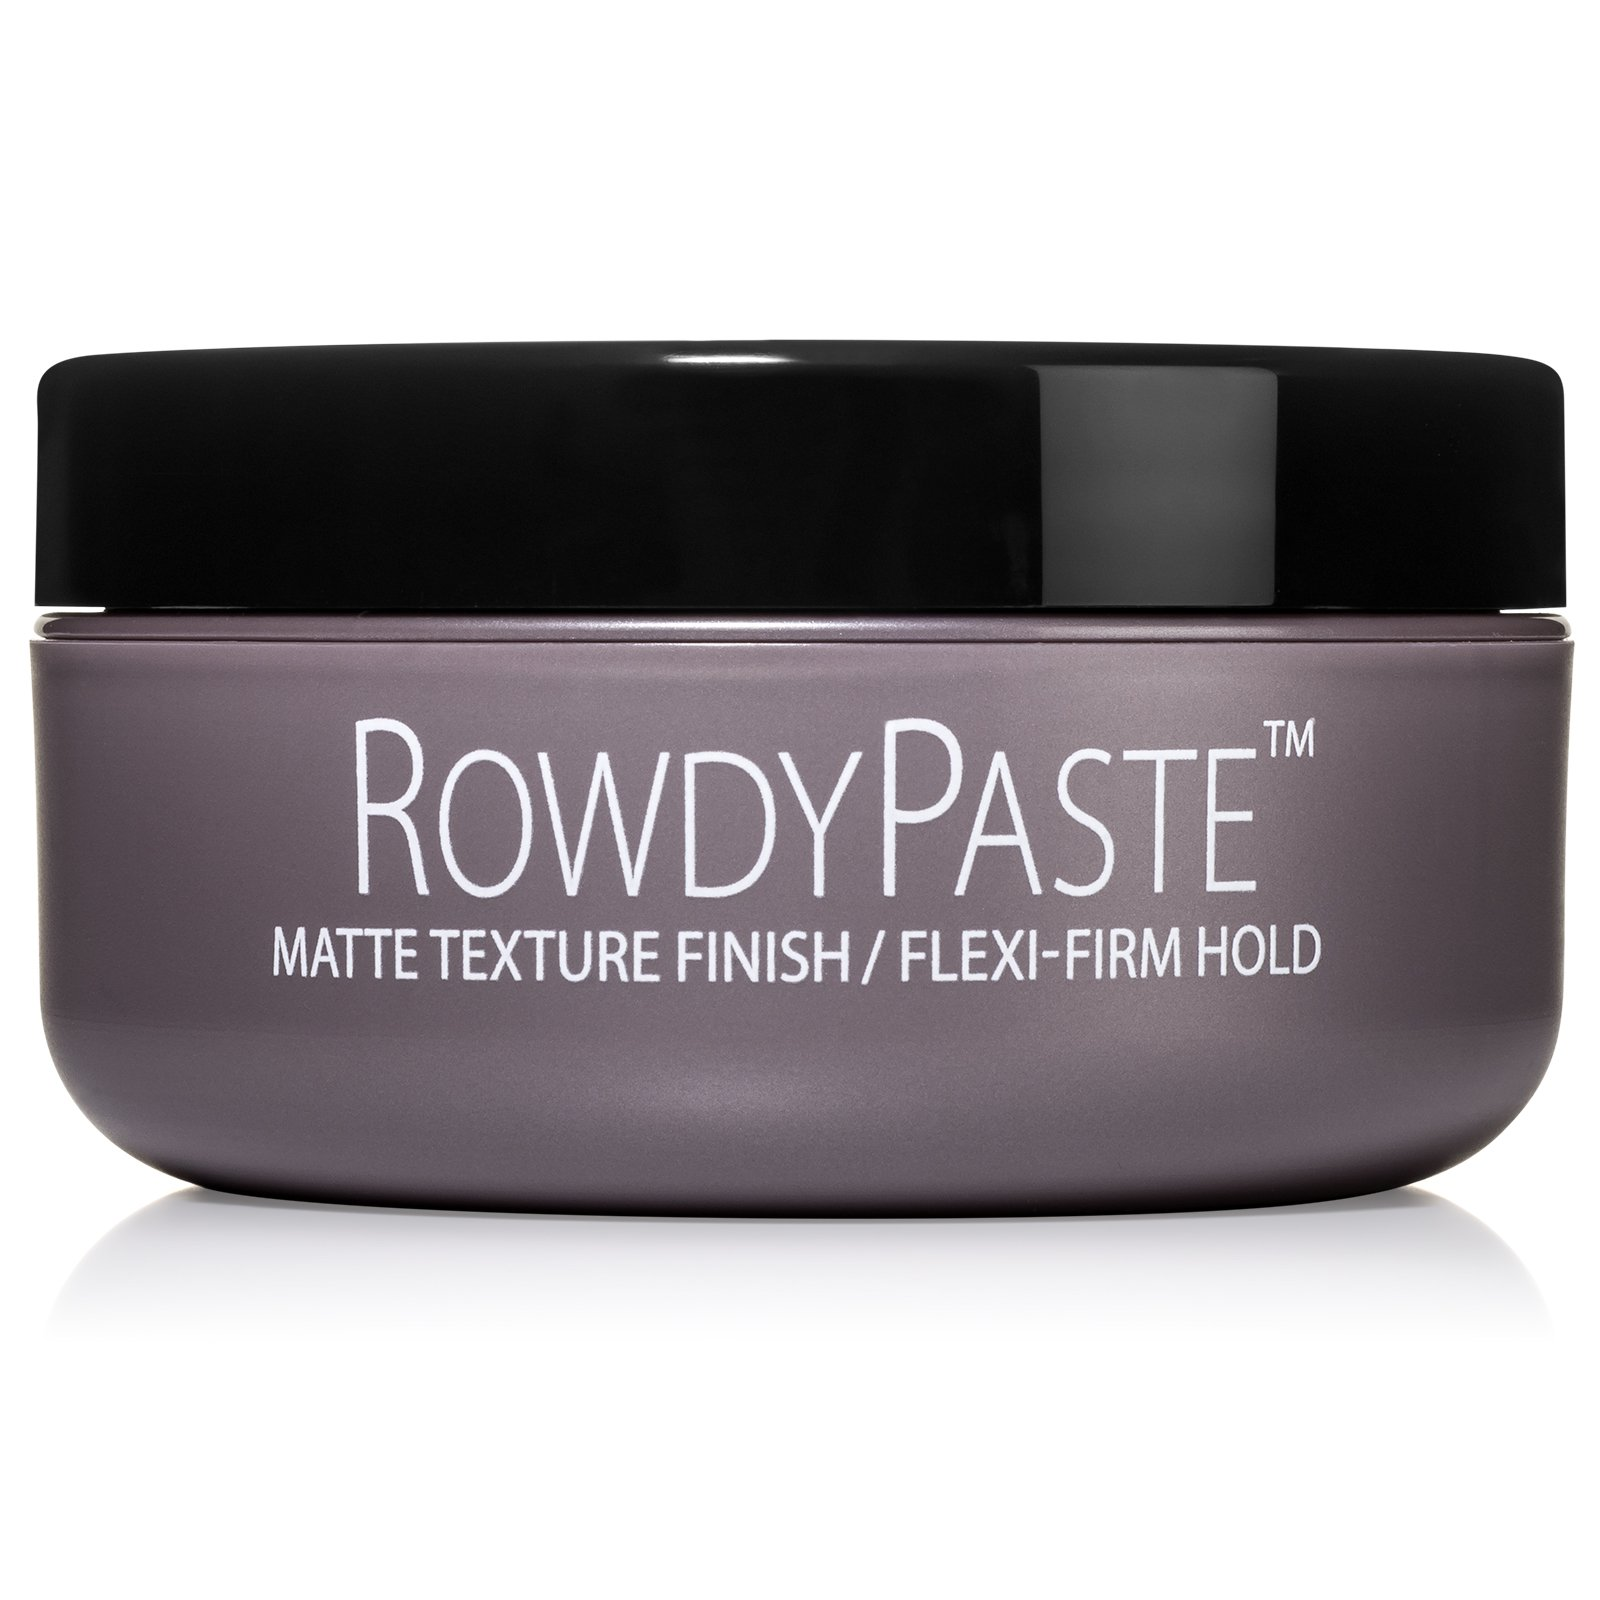 SUDZZFX RowdyPaste Matte Texture Finish